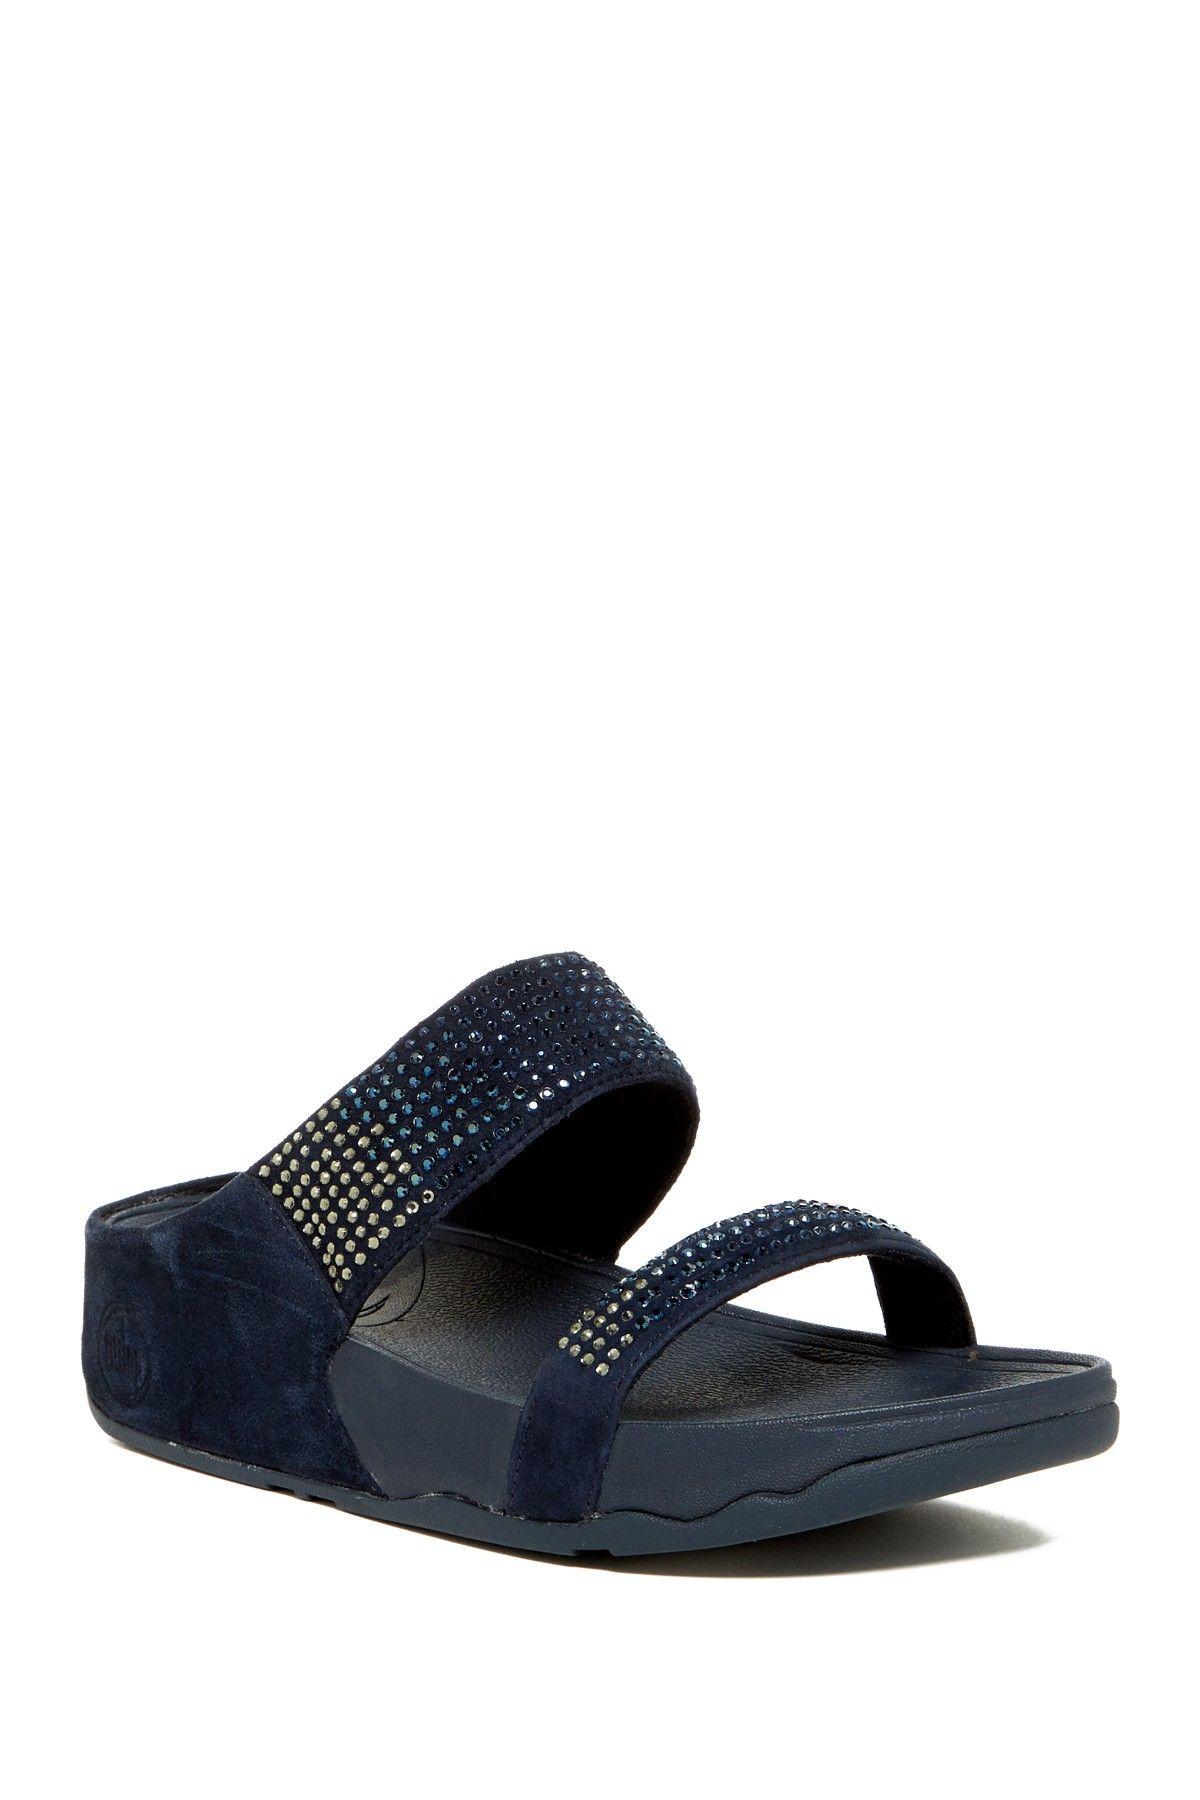 1d2d327dd Flare Slide Sandal Slide Sandals